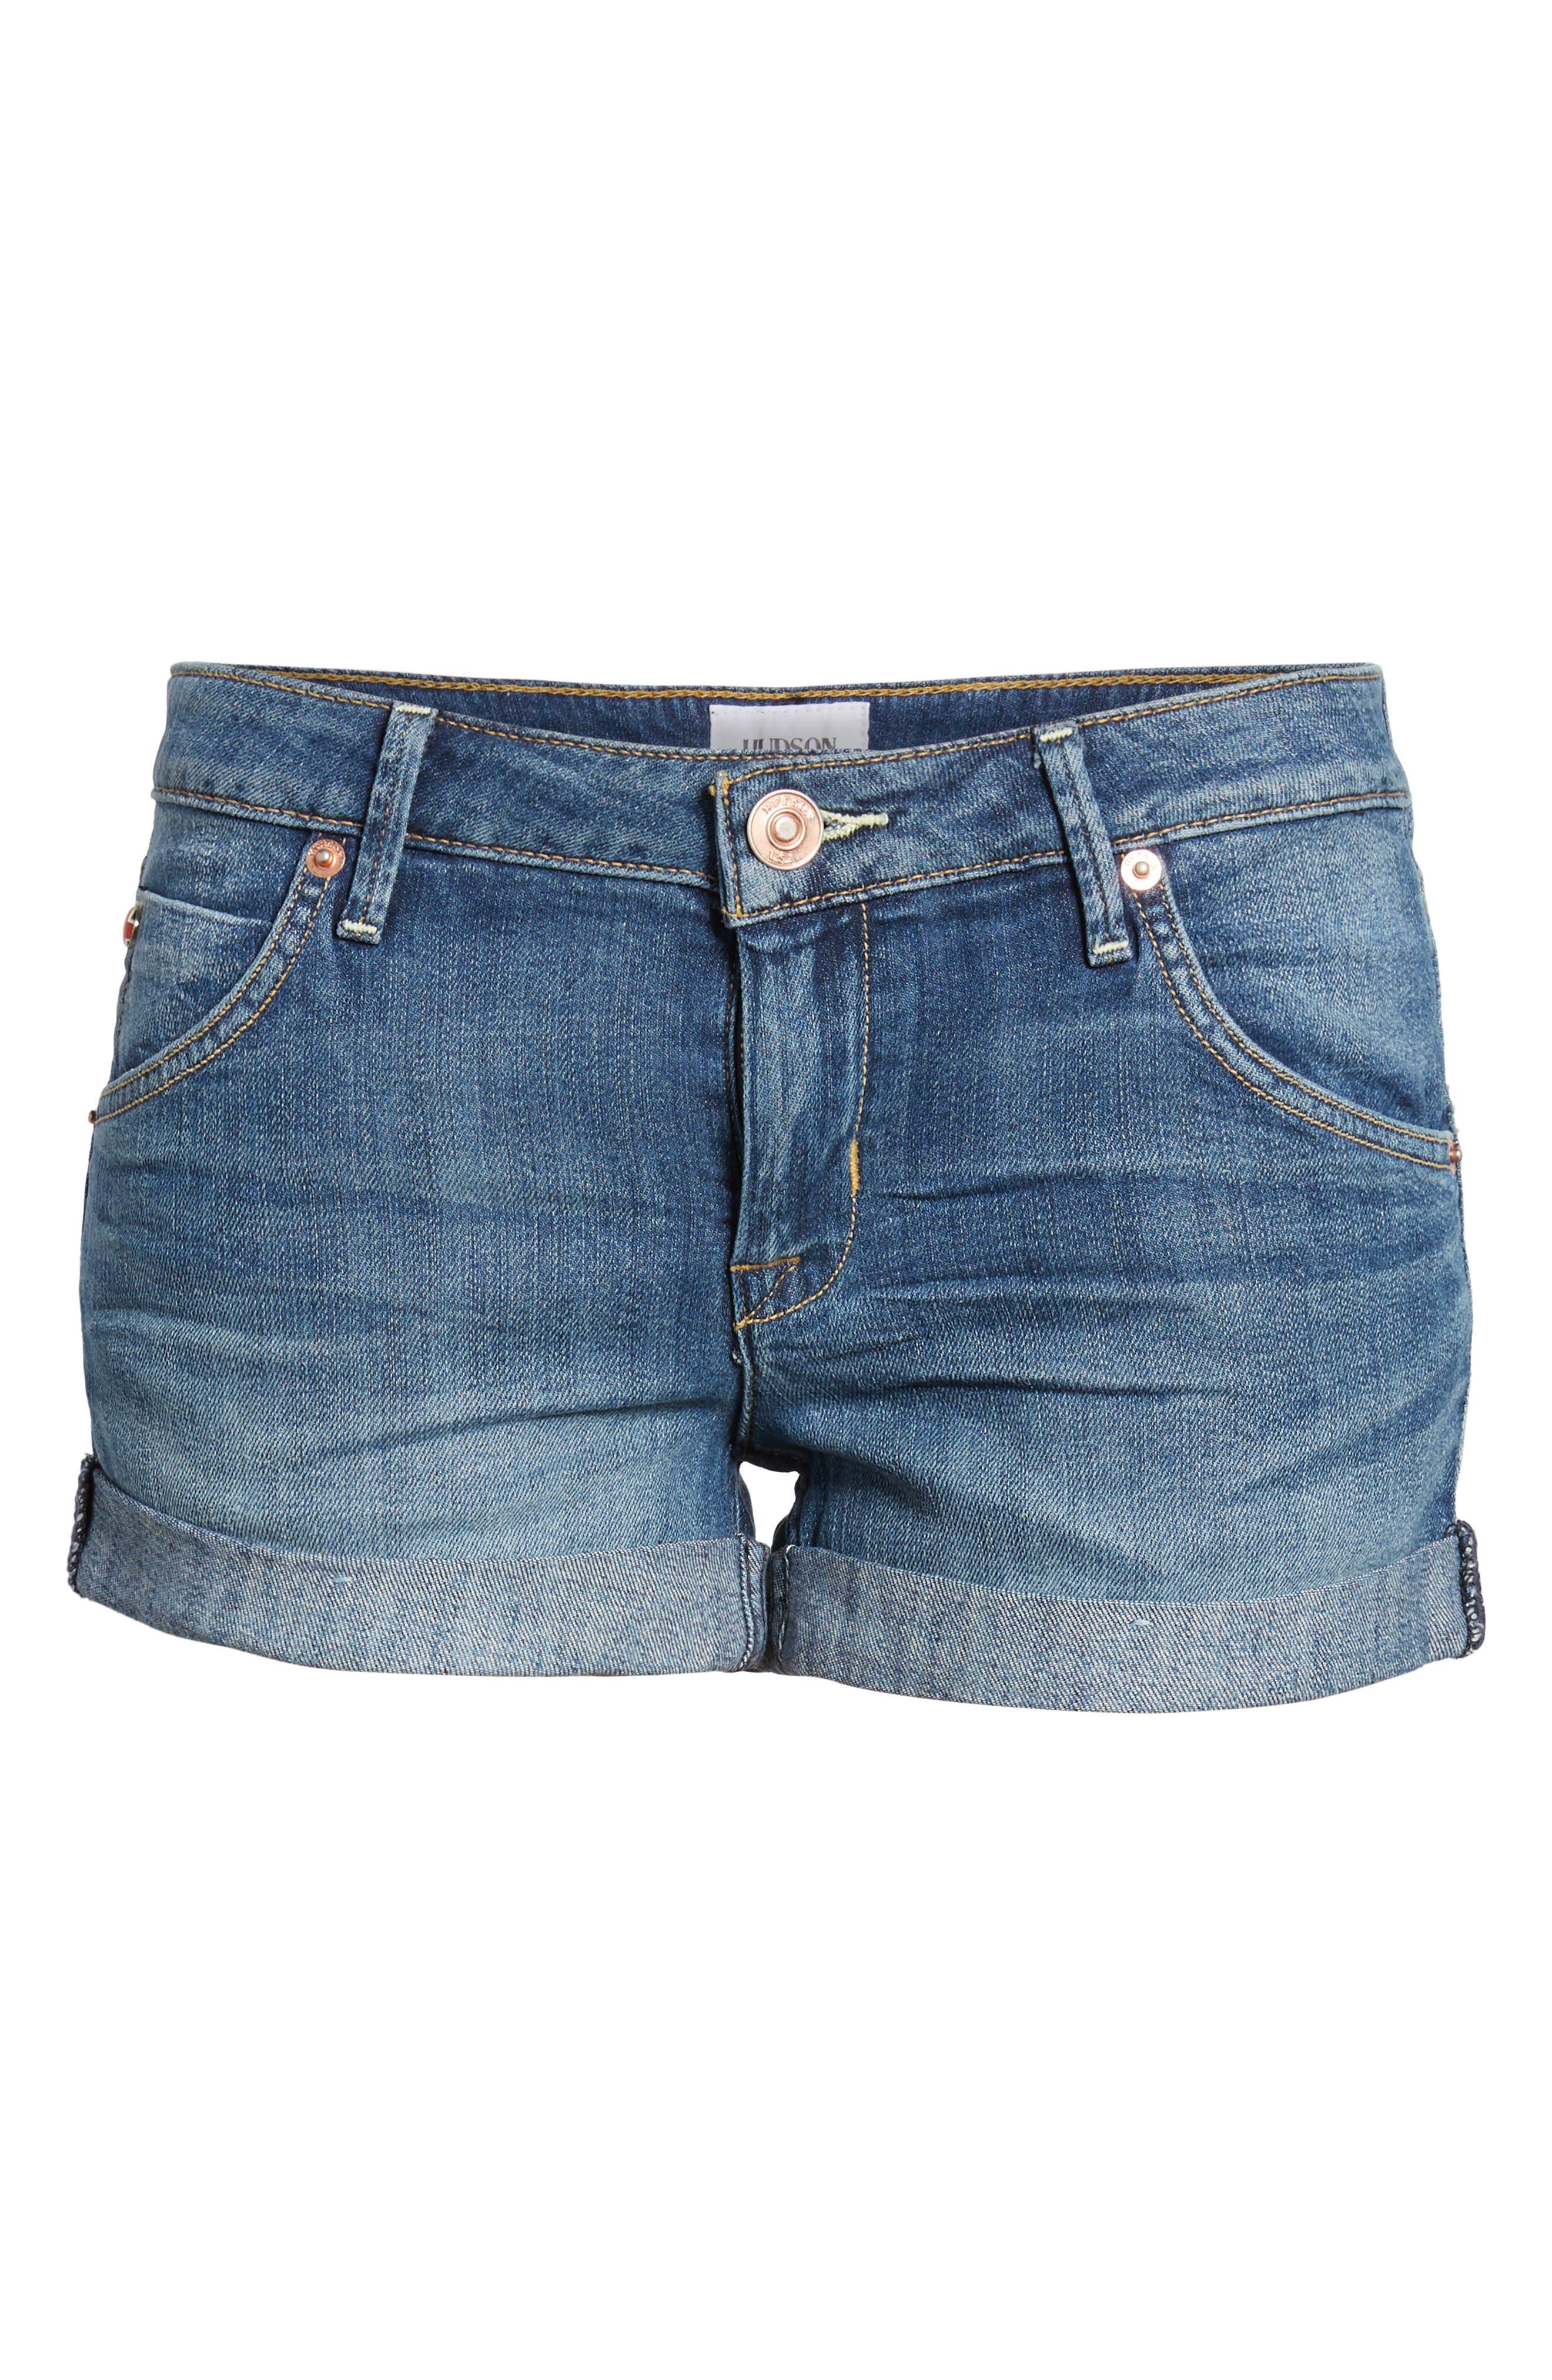 Cuff Denim Shorts,                             Alternate thumbnail 2, color,                             420